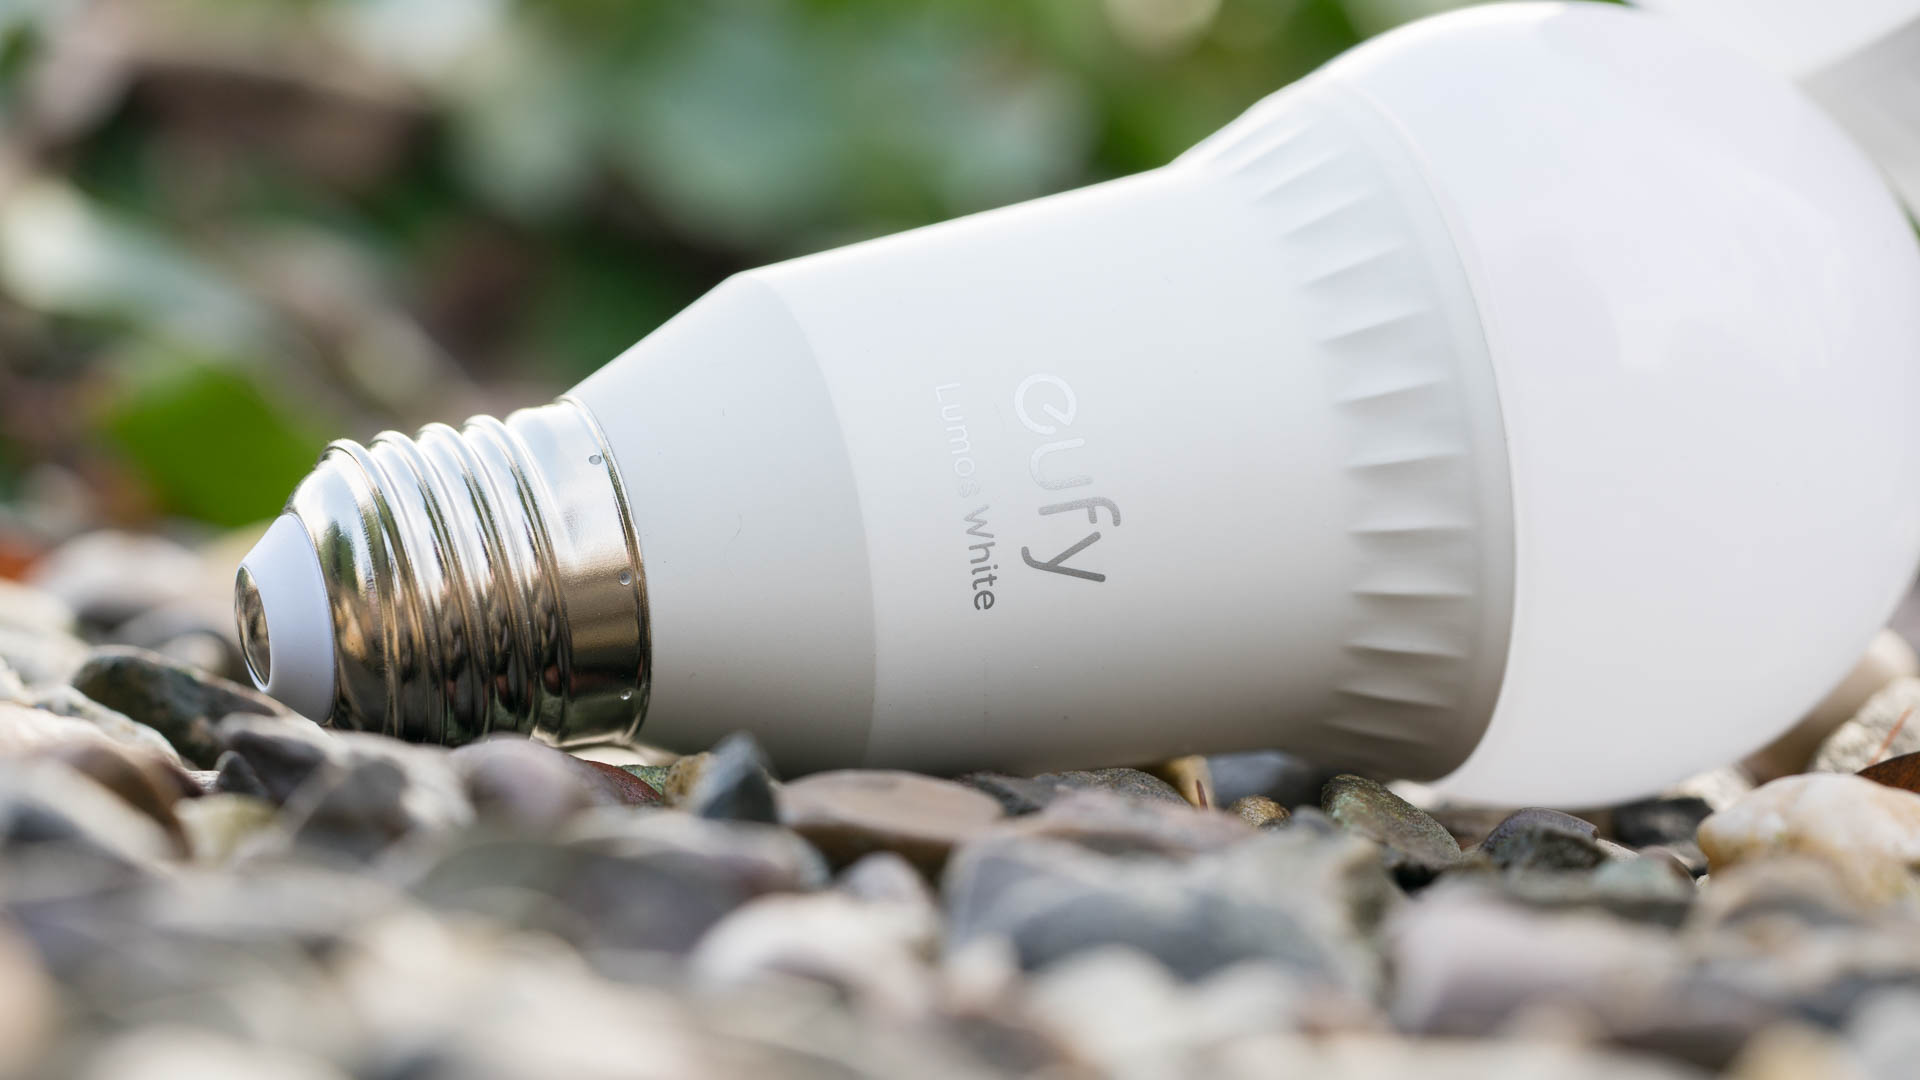 Die Eufy Lumos T1011 Smart LED Wifi Lampe im Test, eine WLAN LED ...